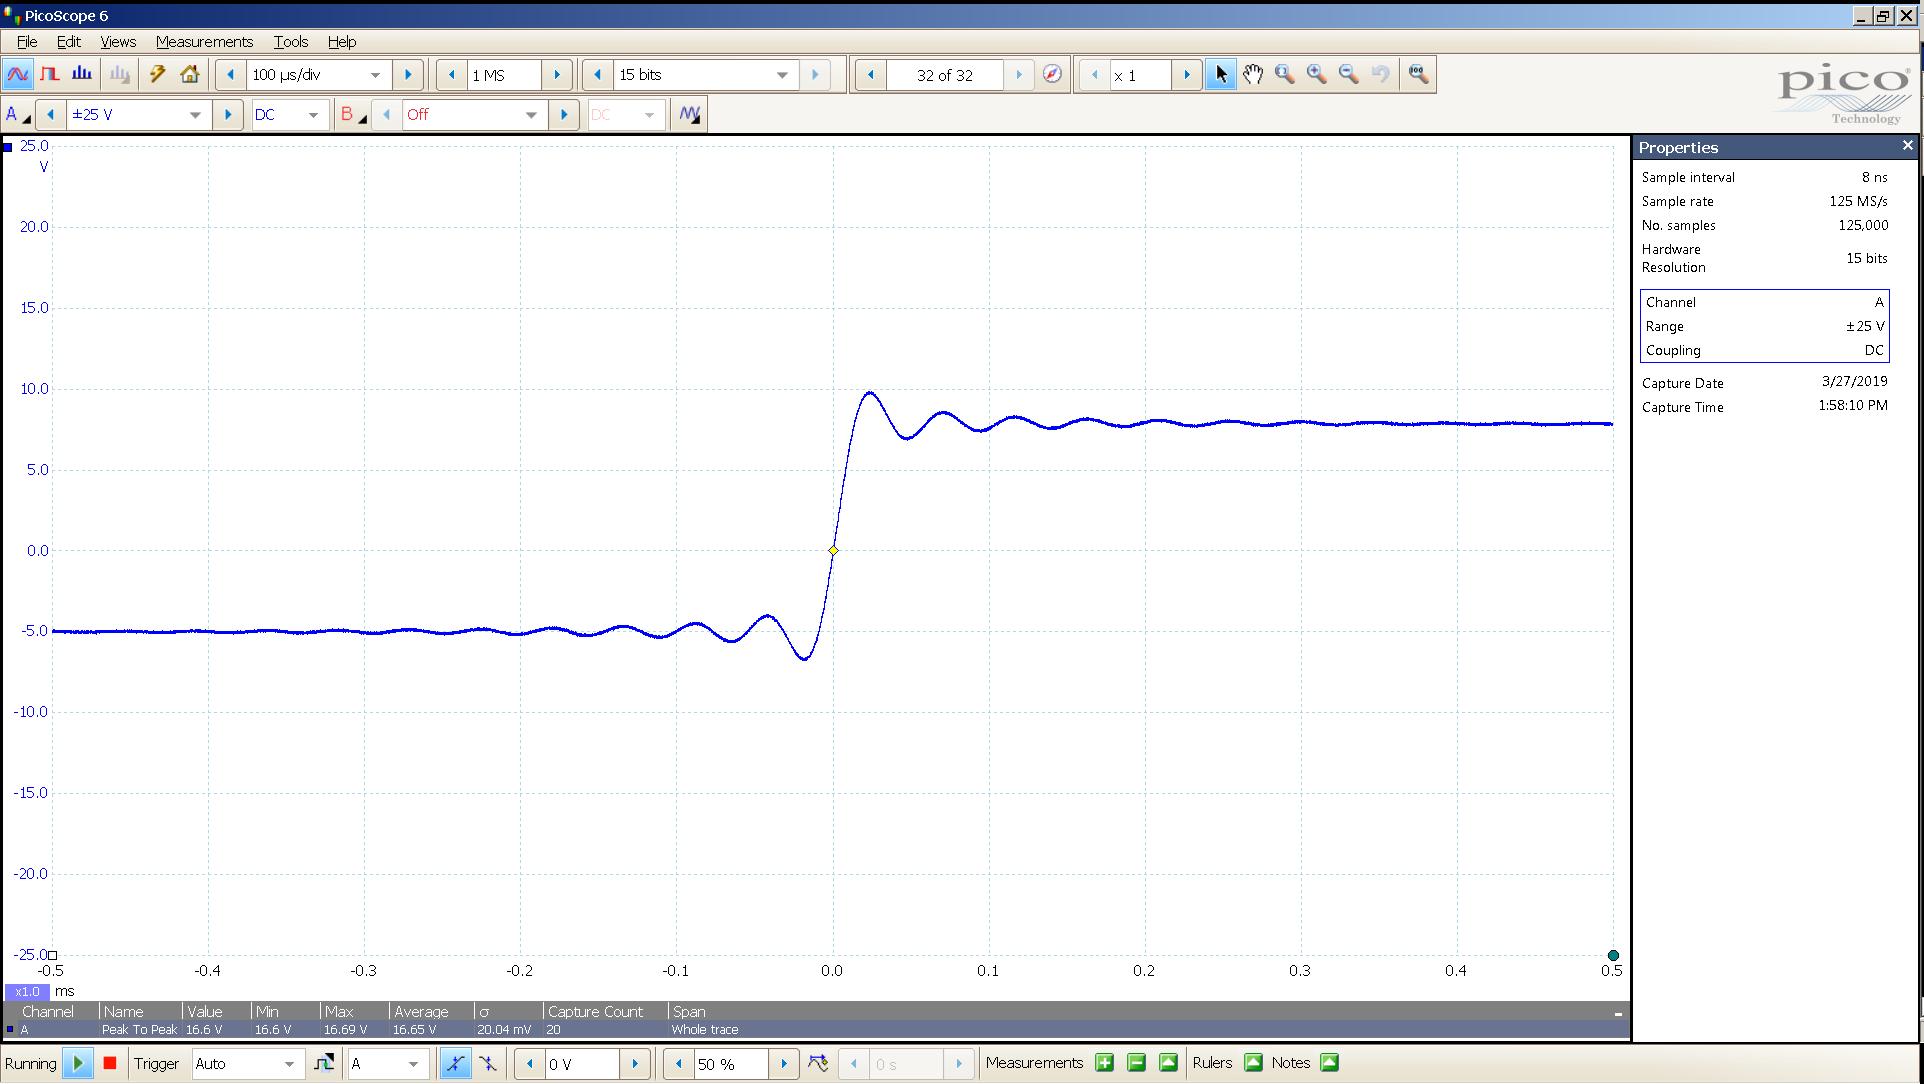 20190327-22 solaris Bal 20 Hz sqr -3 dBFS 16 Vpp 100uS div - USB 44K.PNG